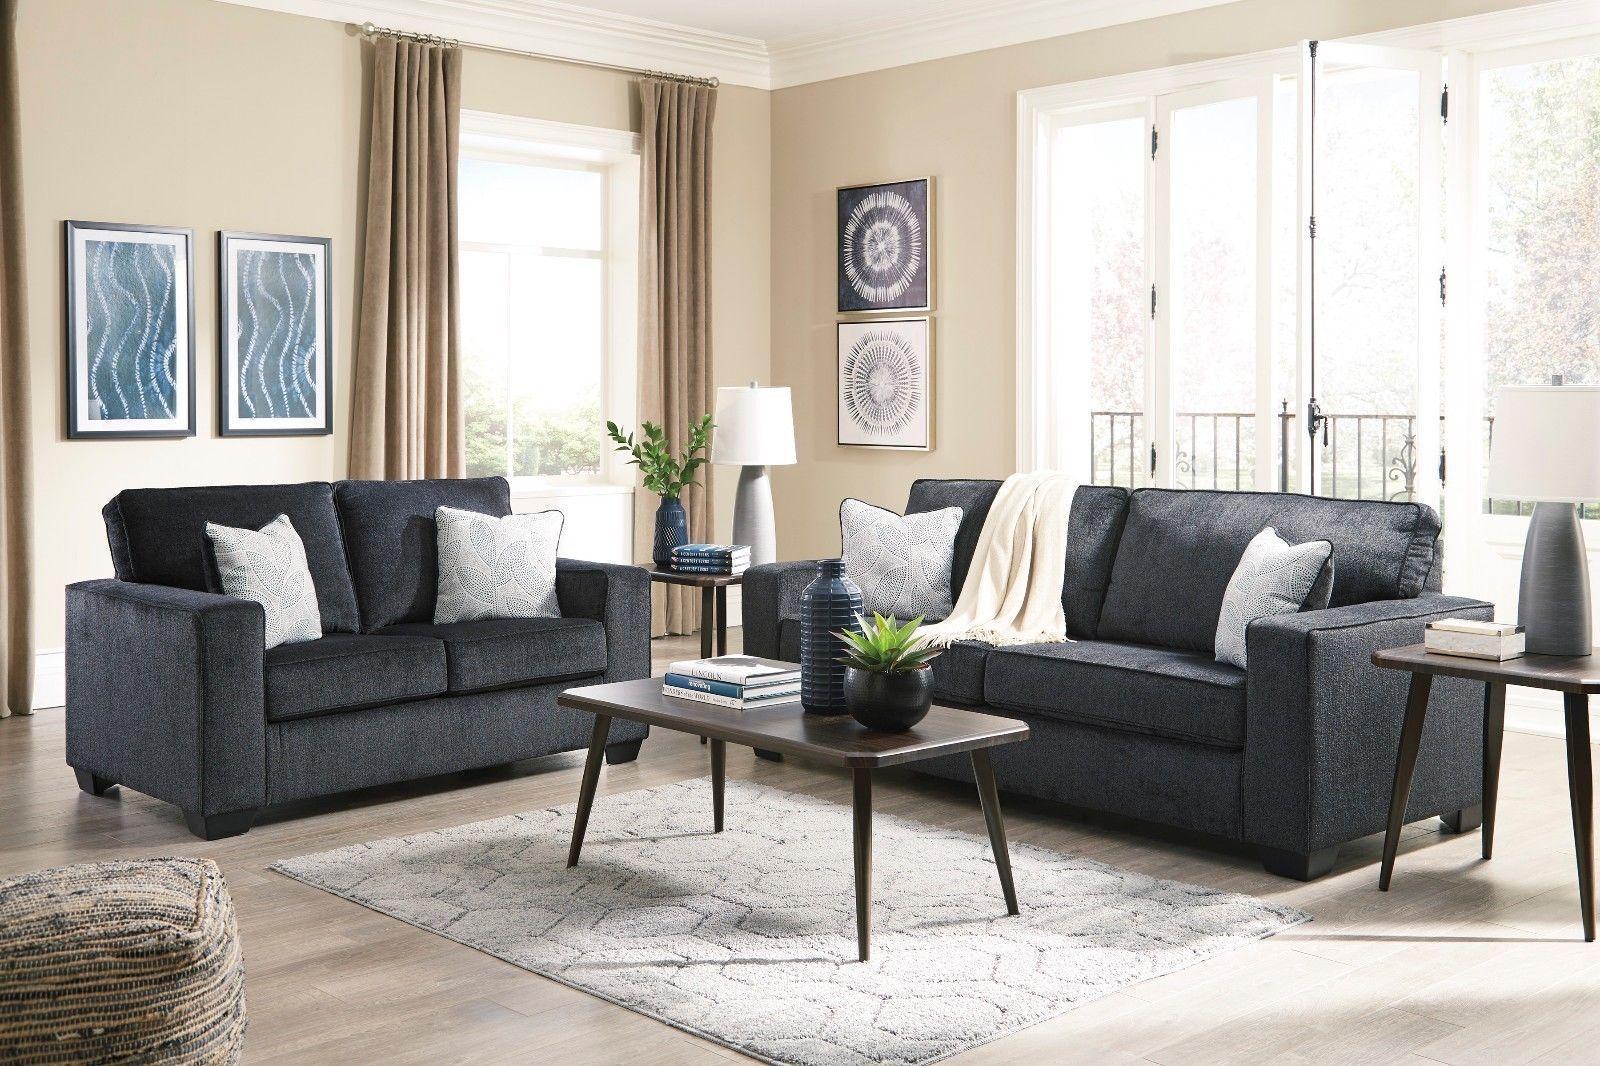 Ashley Furniture Altari Slate Sofa And Loveseat For Sale Online